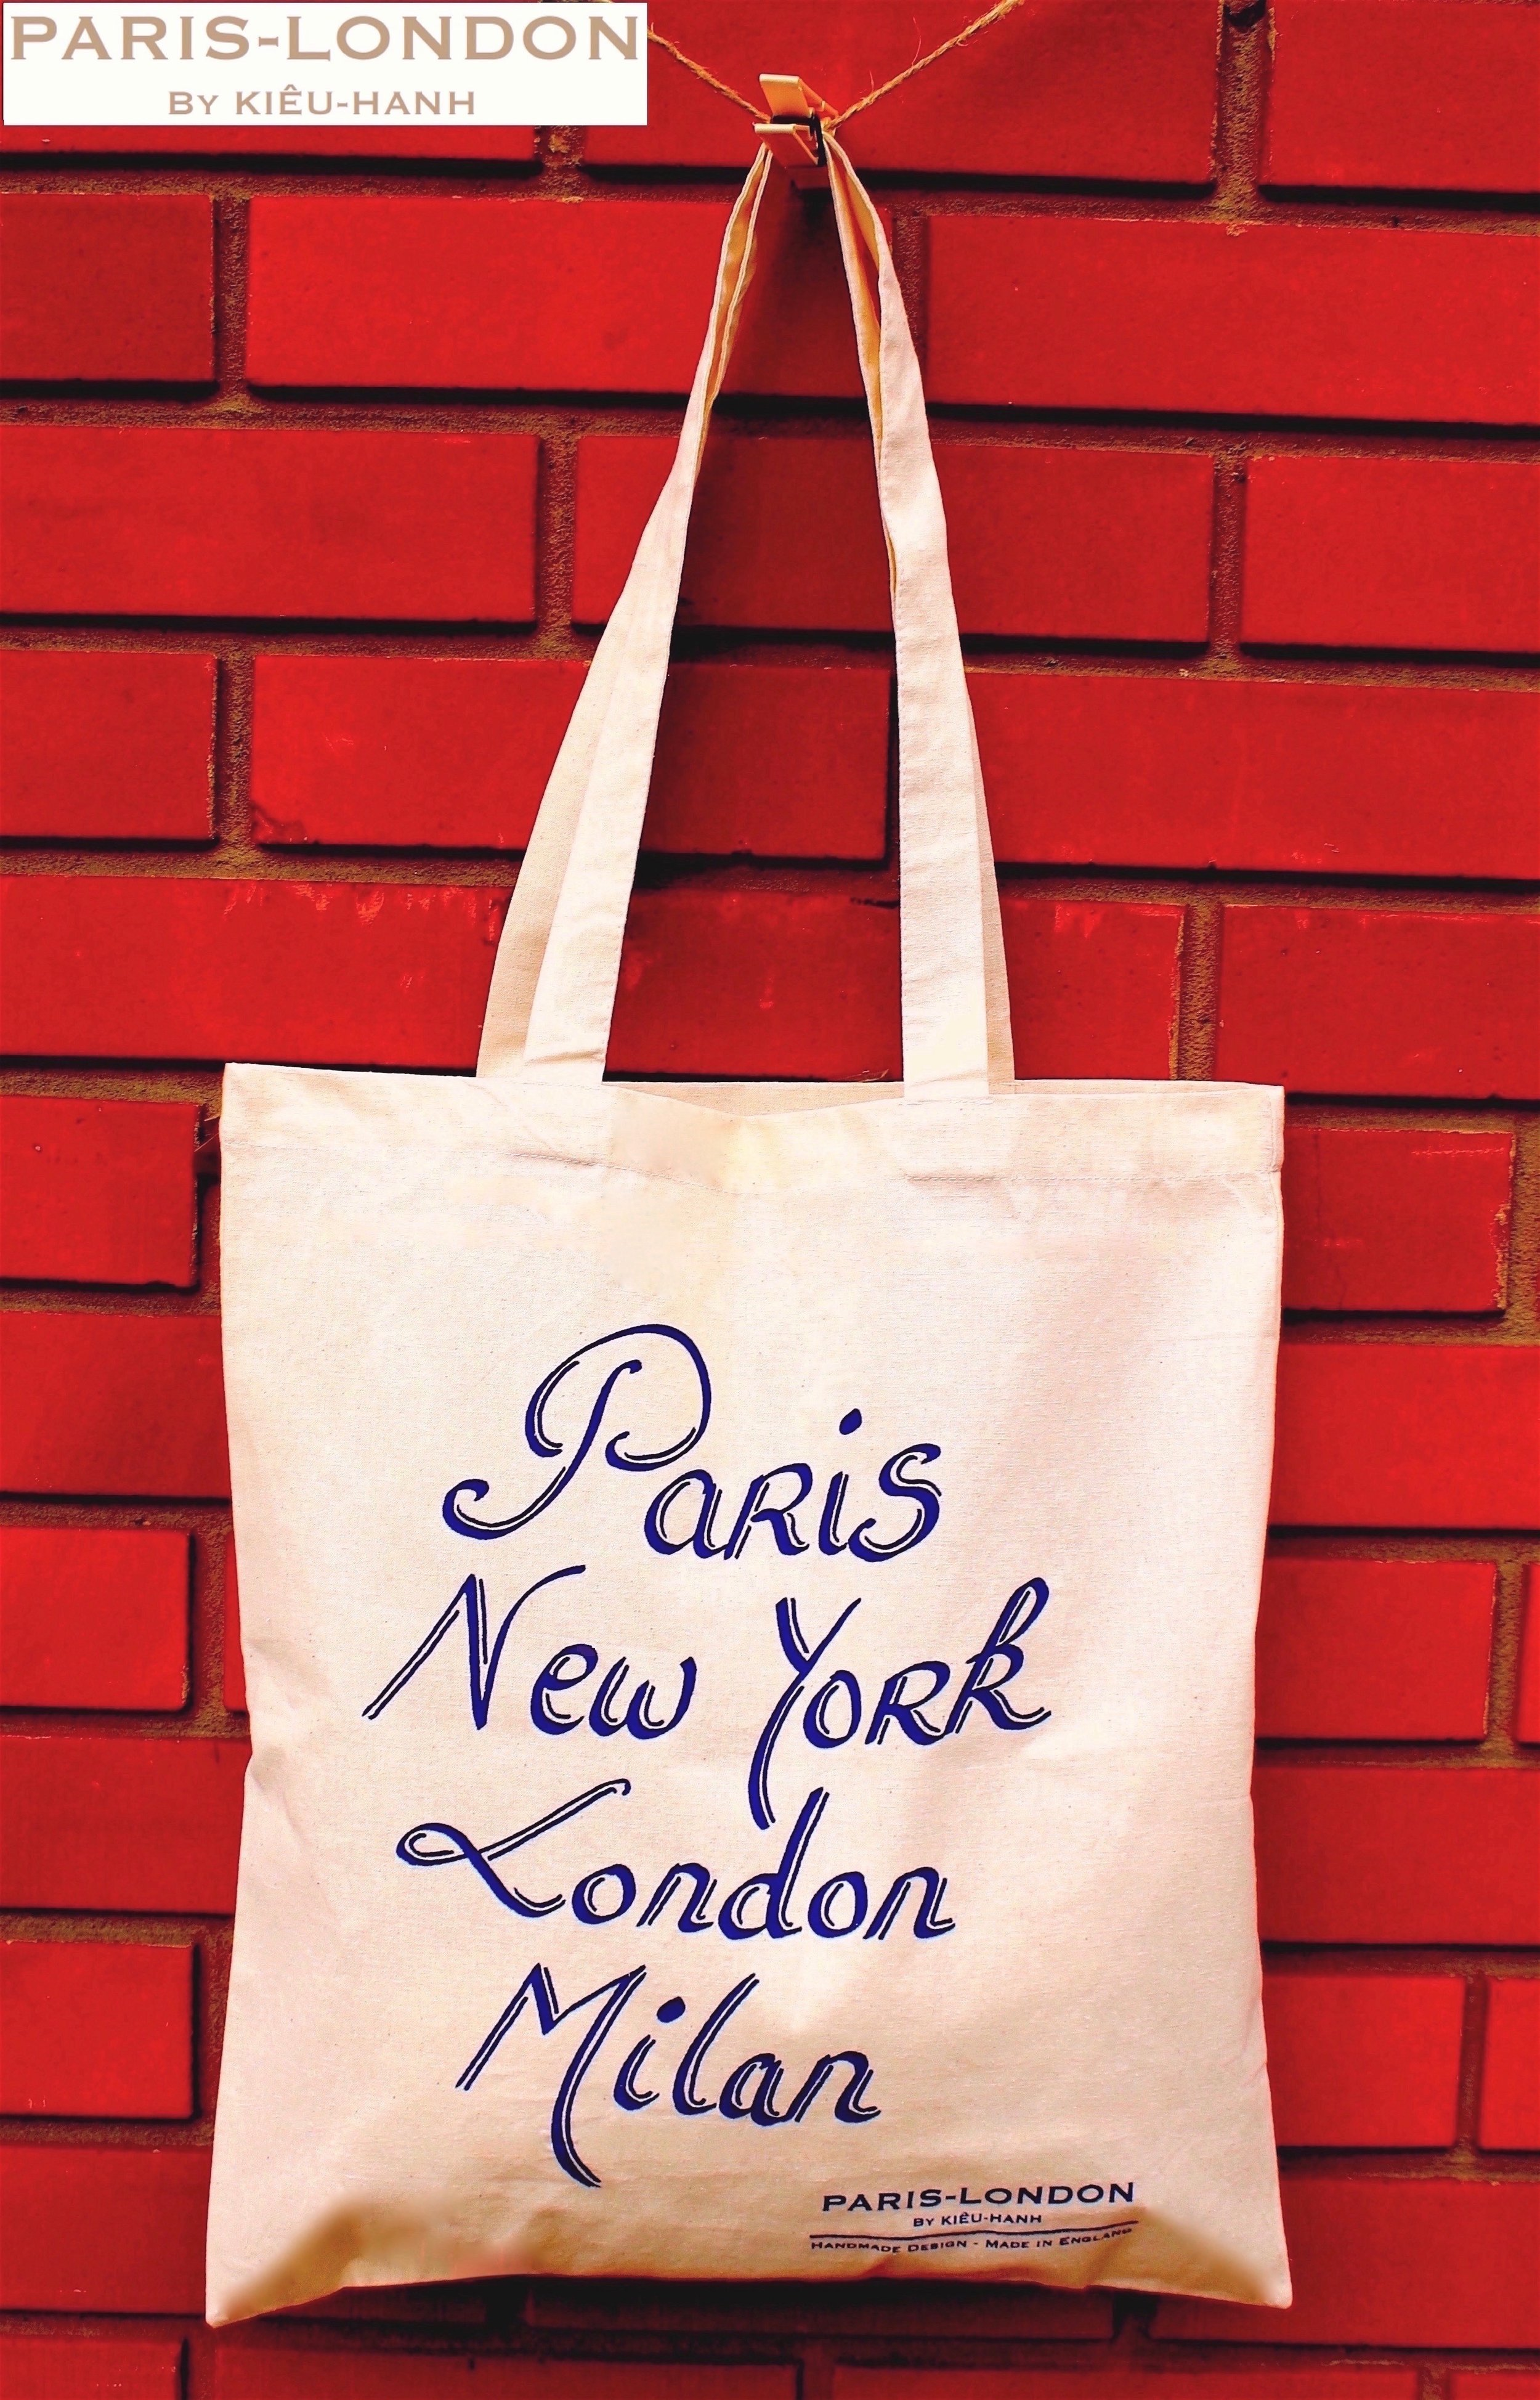 Blue (2.3). Paris-London By Kieu-Hanh (2).jpg